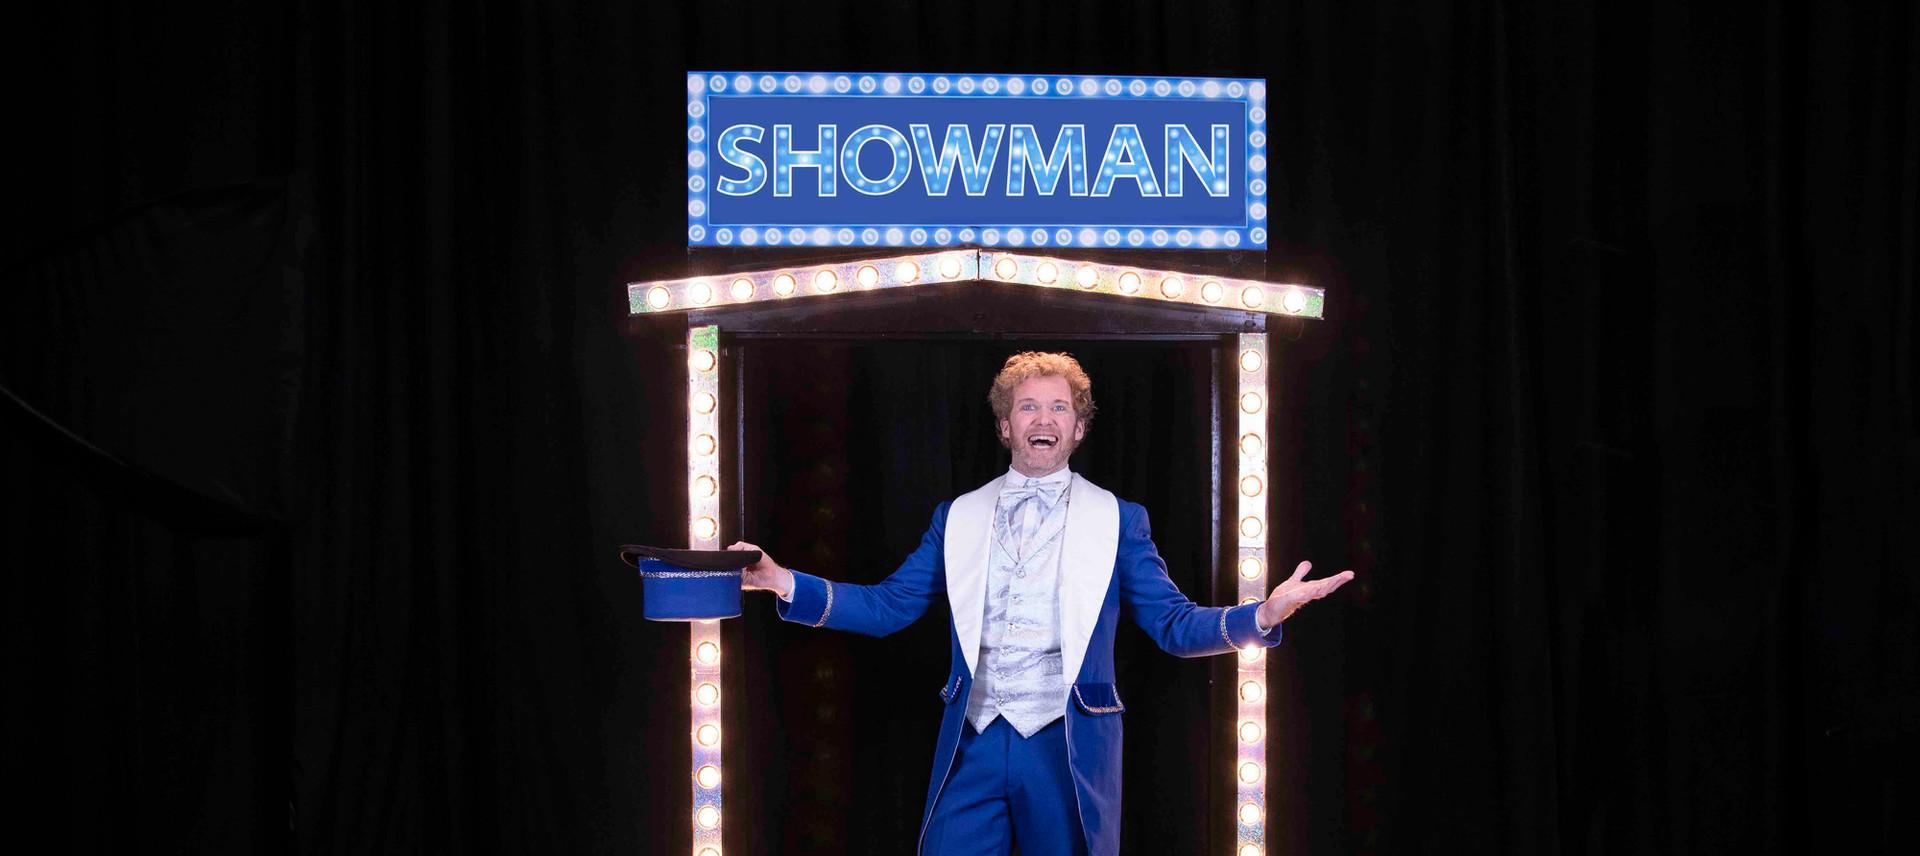 Showman presentator gastheer.jpg